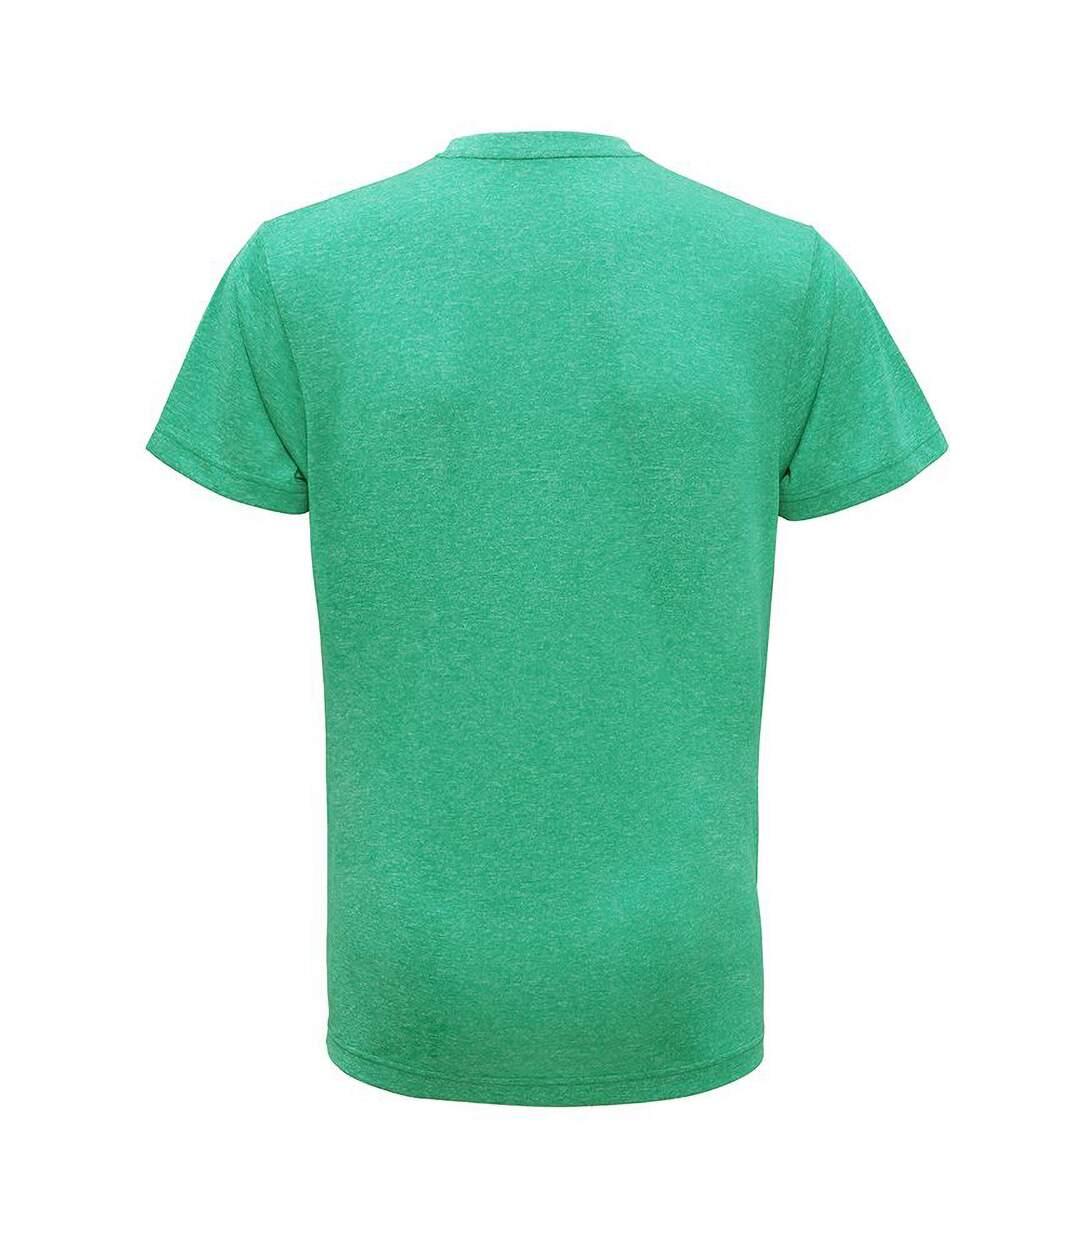 Tri Dri Mens Short Sleeve Lightweight Fitness T-Shirt (Black) - UTRW4798